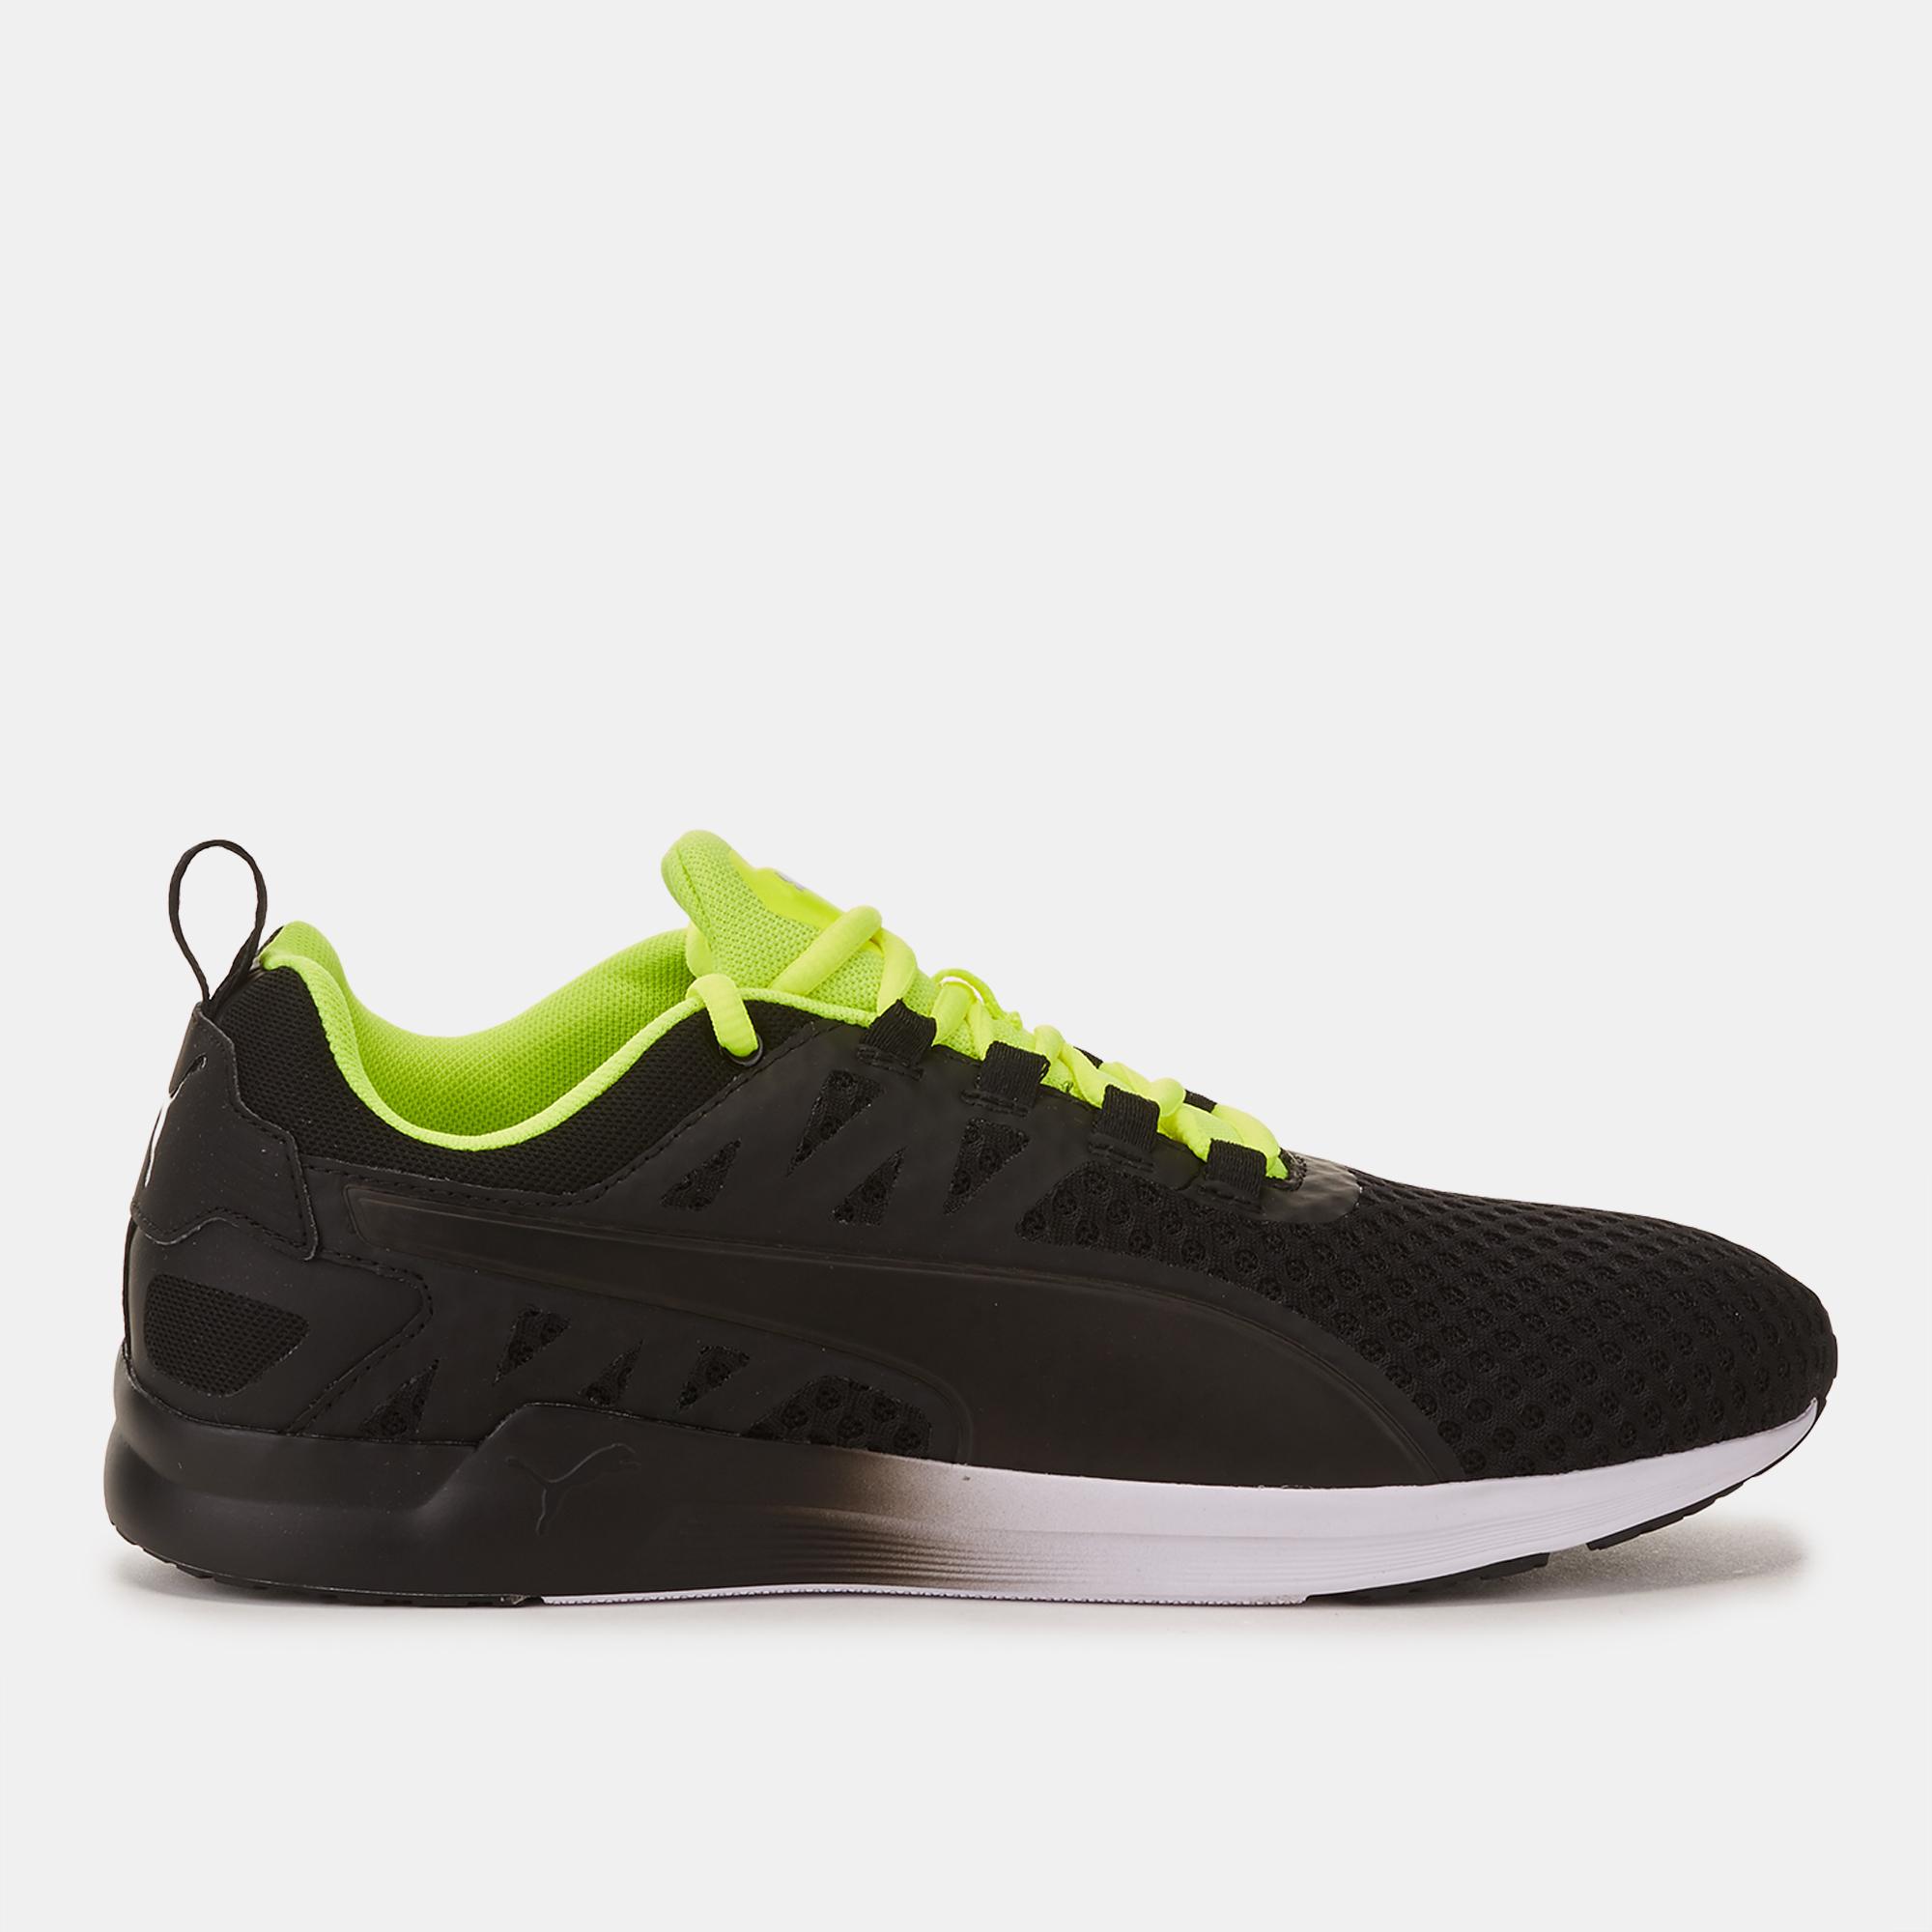 977aa5bd85b9 PUMA Pulse XT v2 Mesh Training Shoe